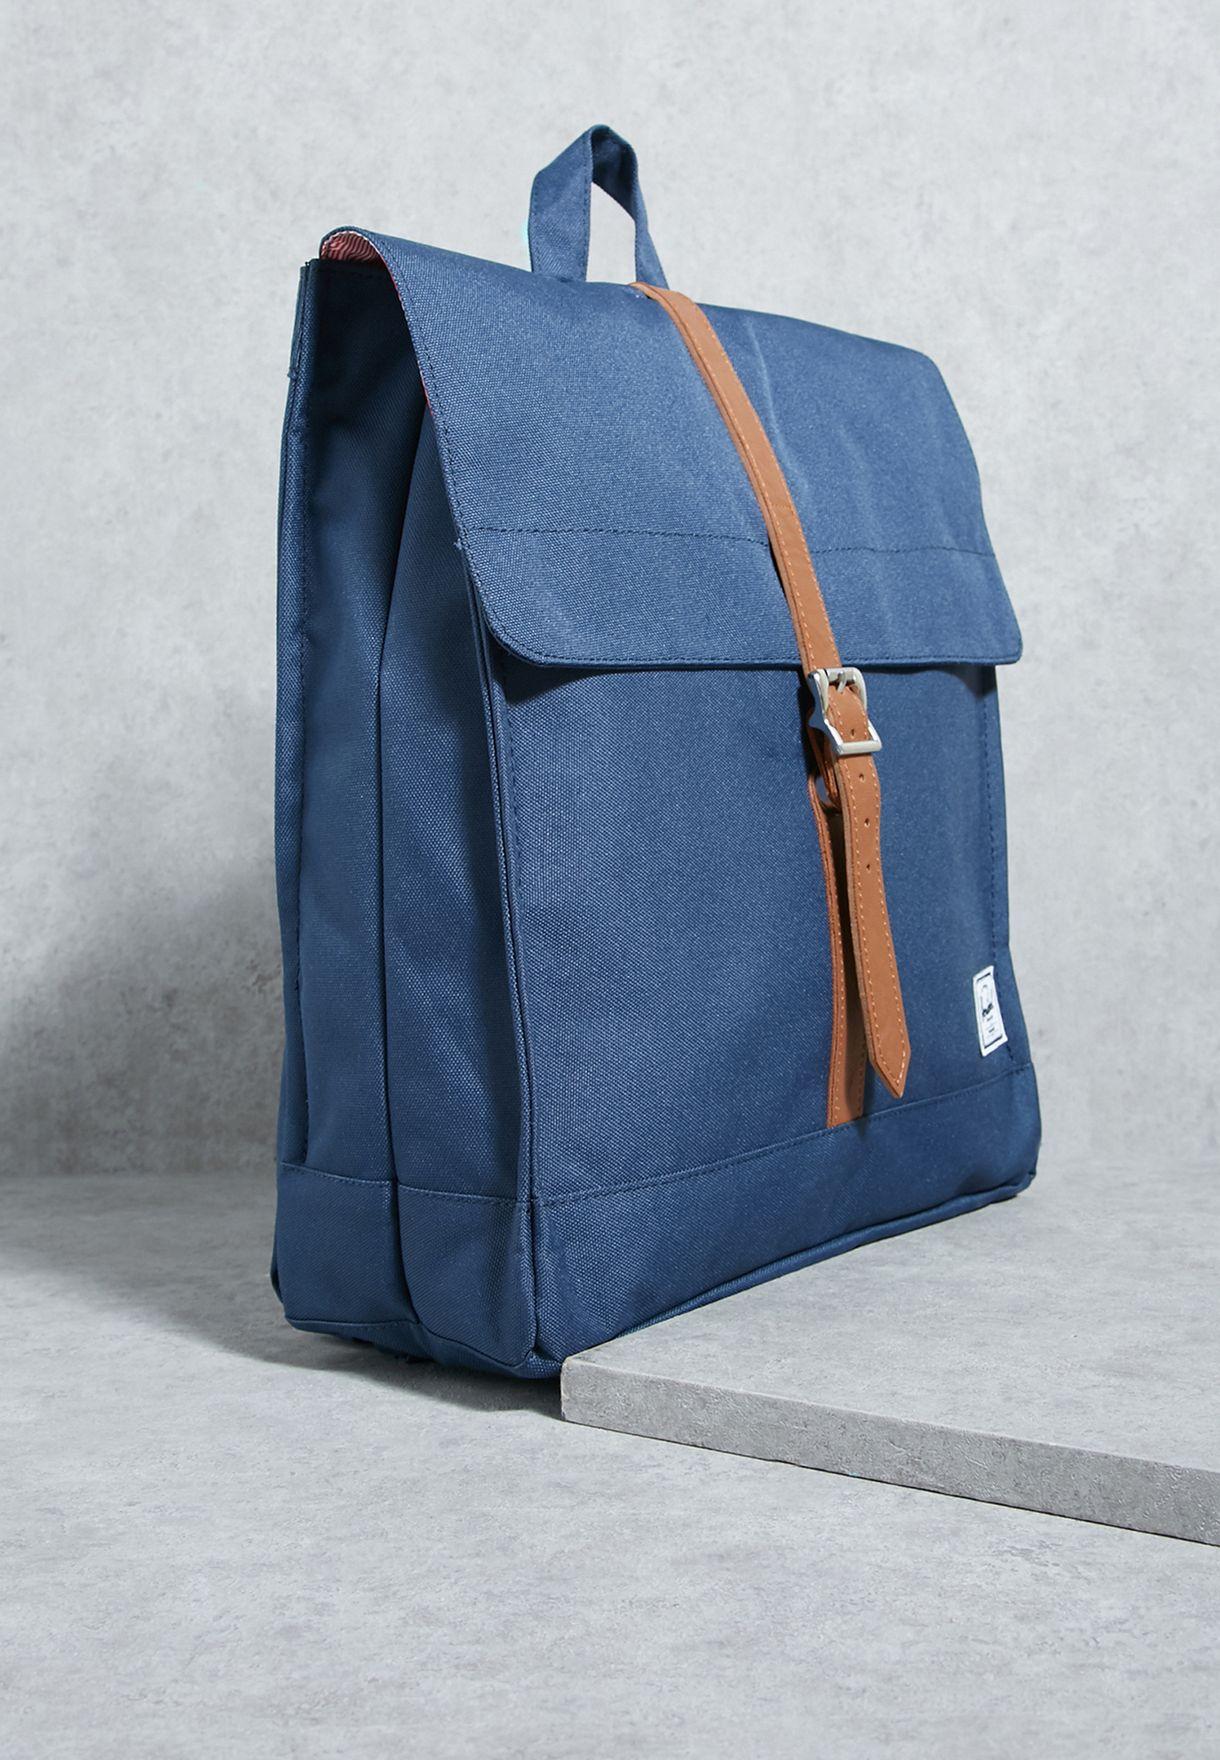 Shop Herschel navy Mid-Volume City Backpack 10089-00007-OS for Women ... f9a28c5d49a9f